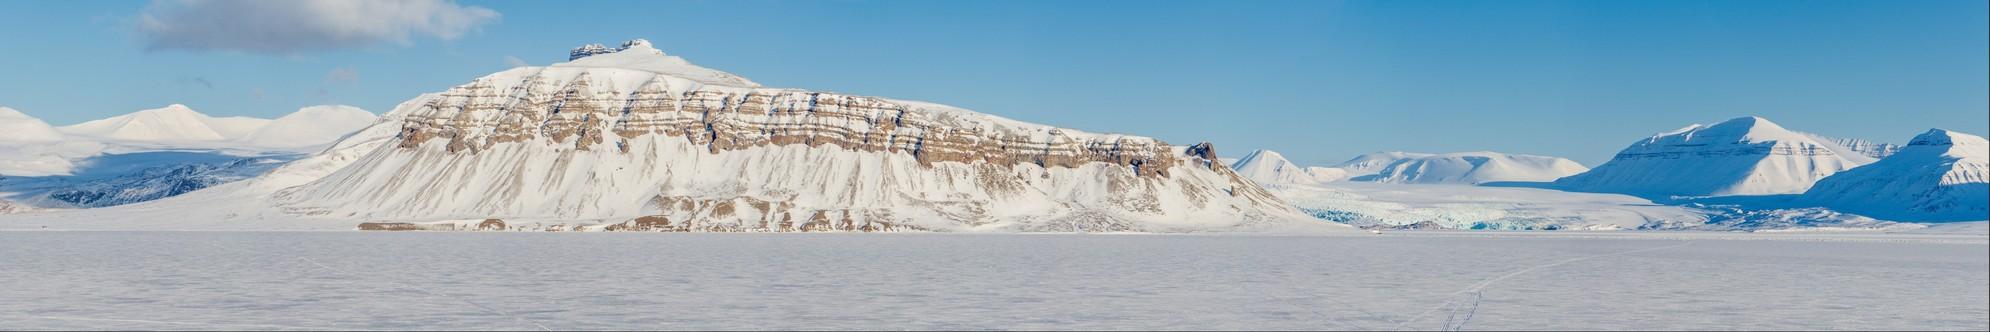 Winter on Svalbard - view of Petuniabukta and local glacier